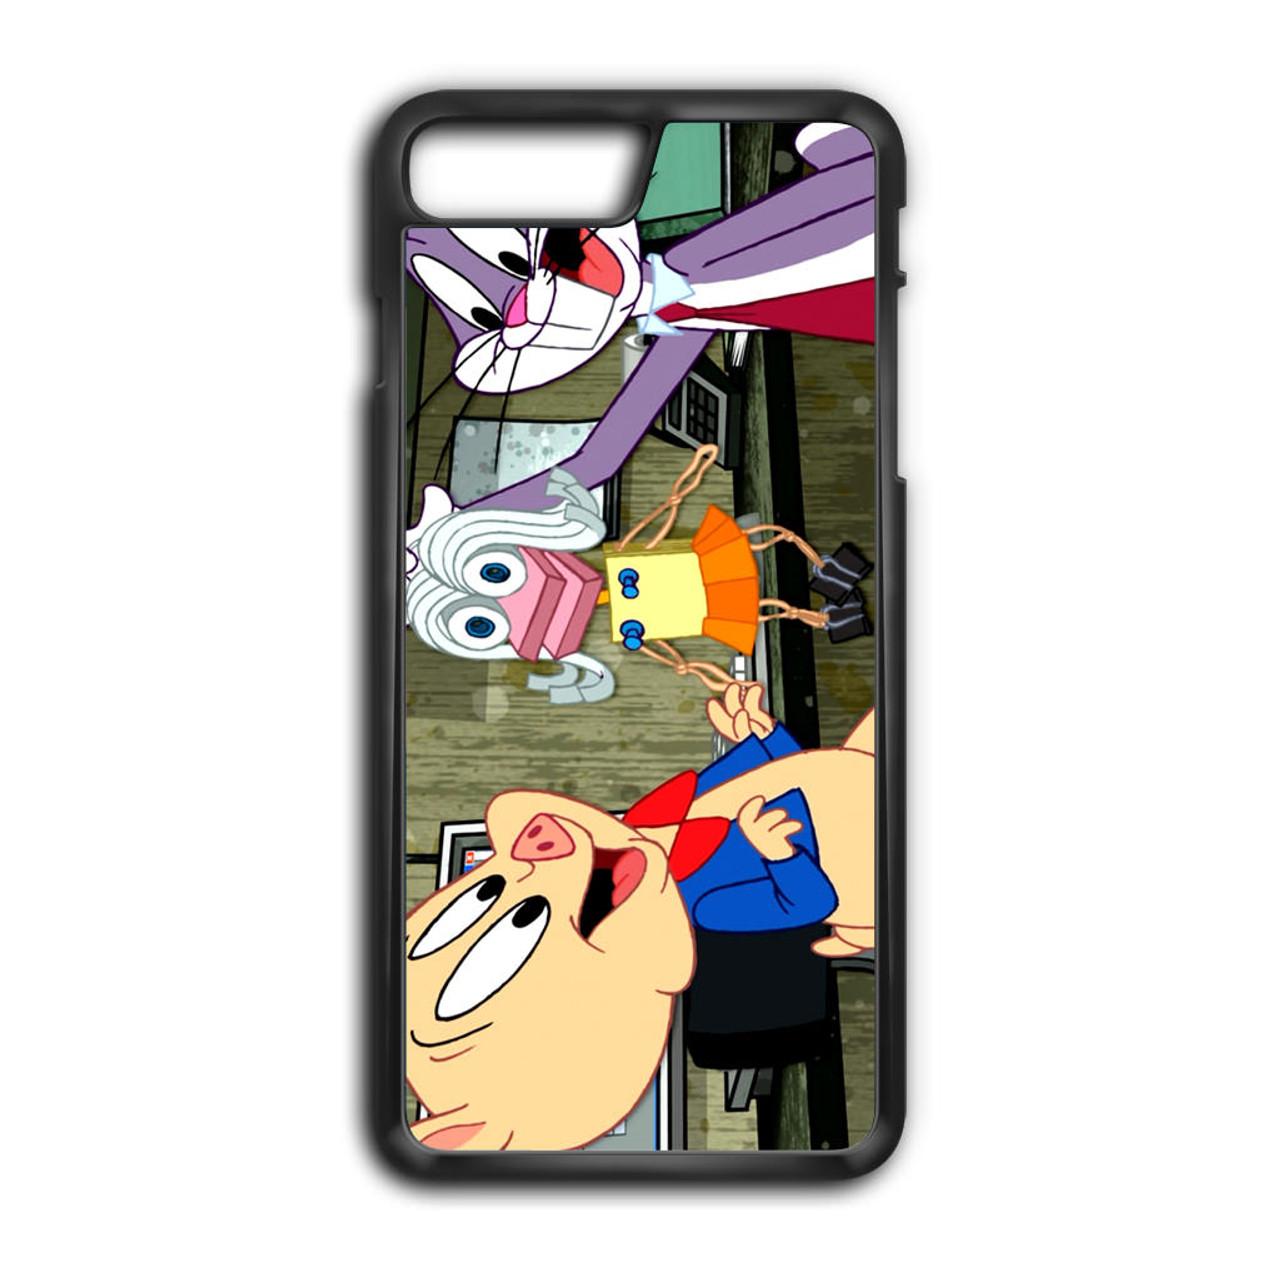 hot sale online 49f5d 06186 Cartoon Porky Pig Bugs Bunny iPhone 7 Plus Case